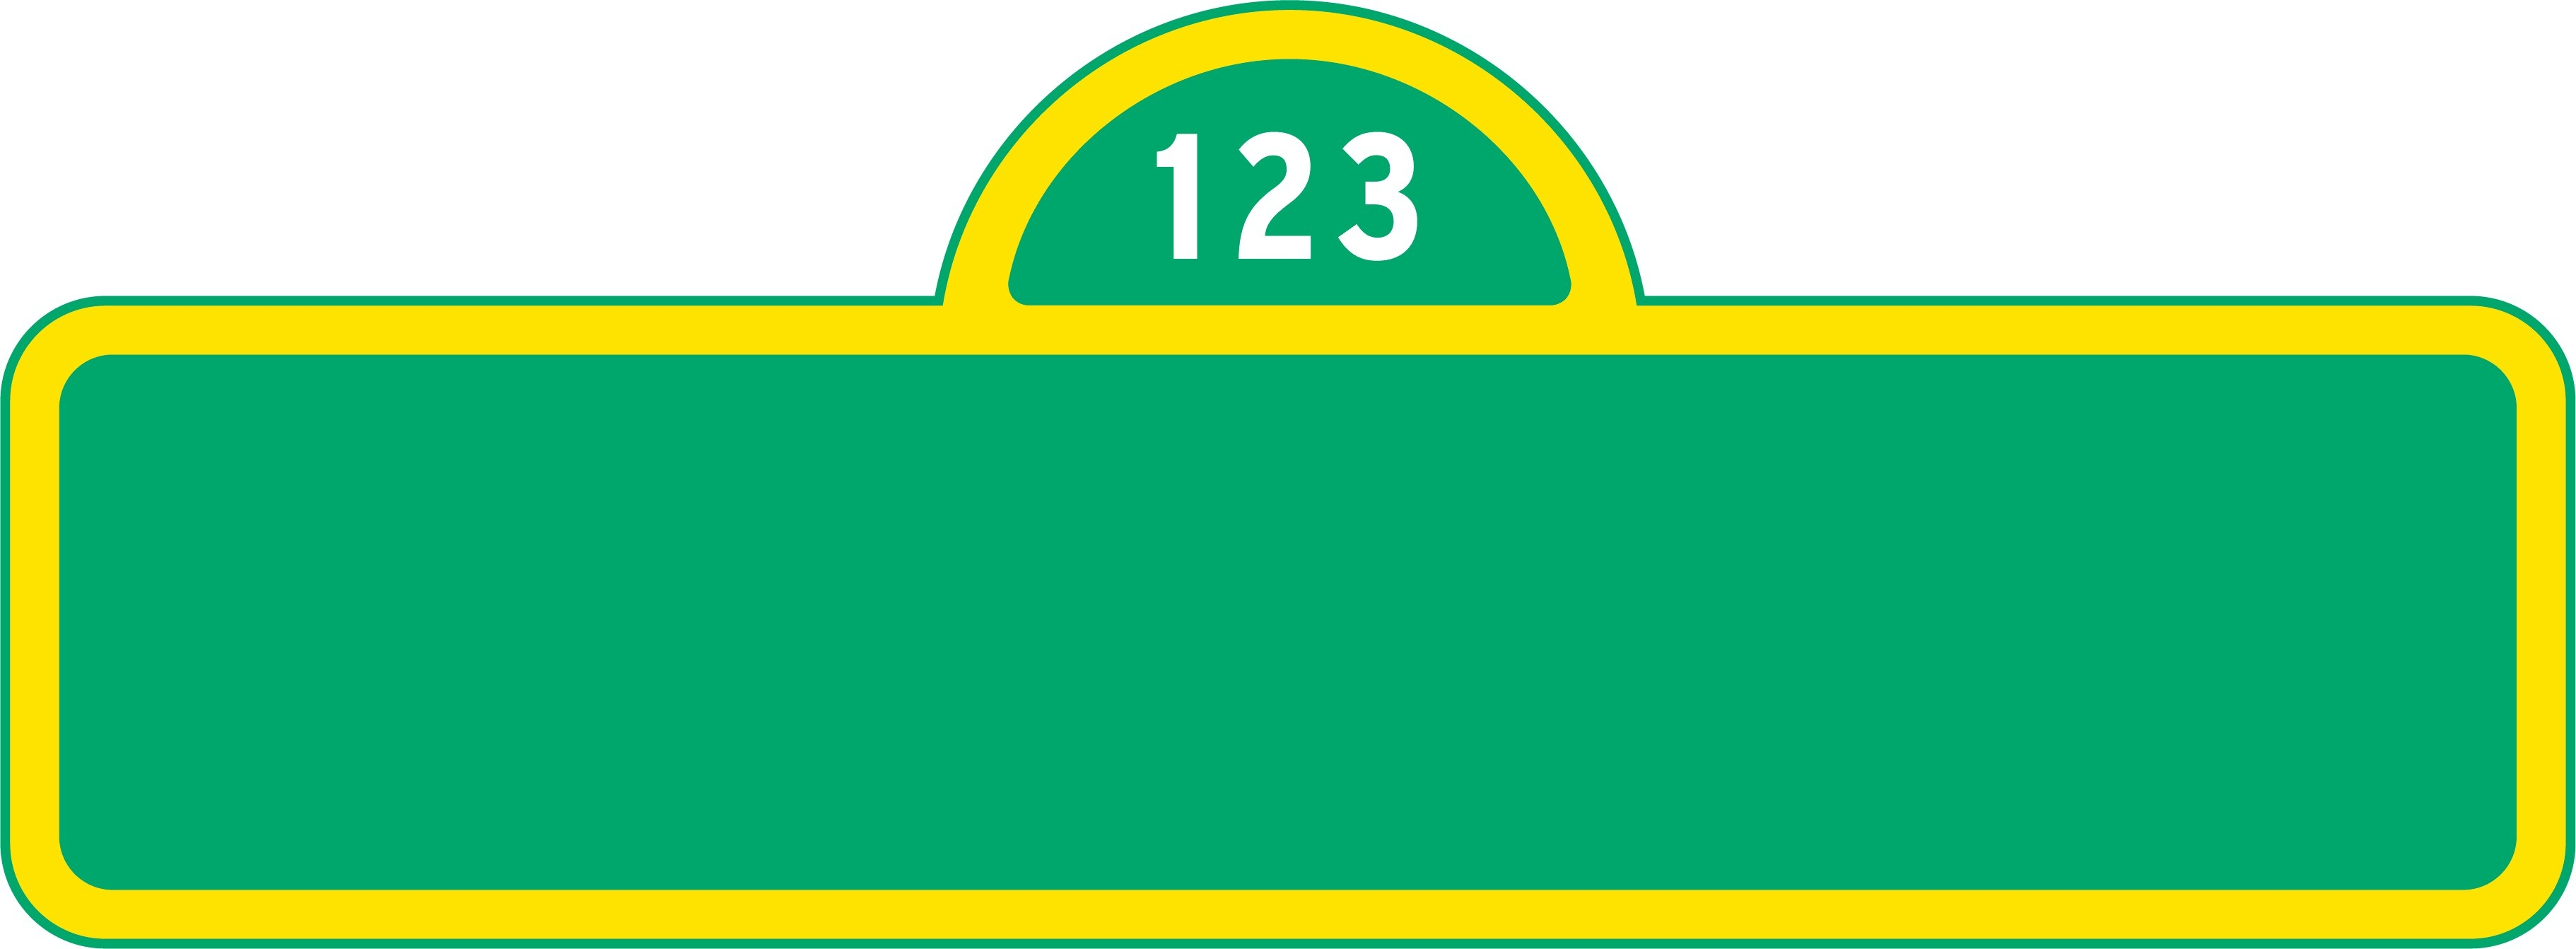 Sesame Street Logos - Free Printable Sesame Street Sign